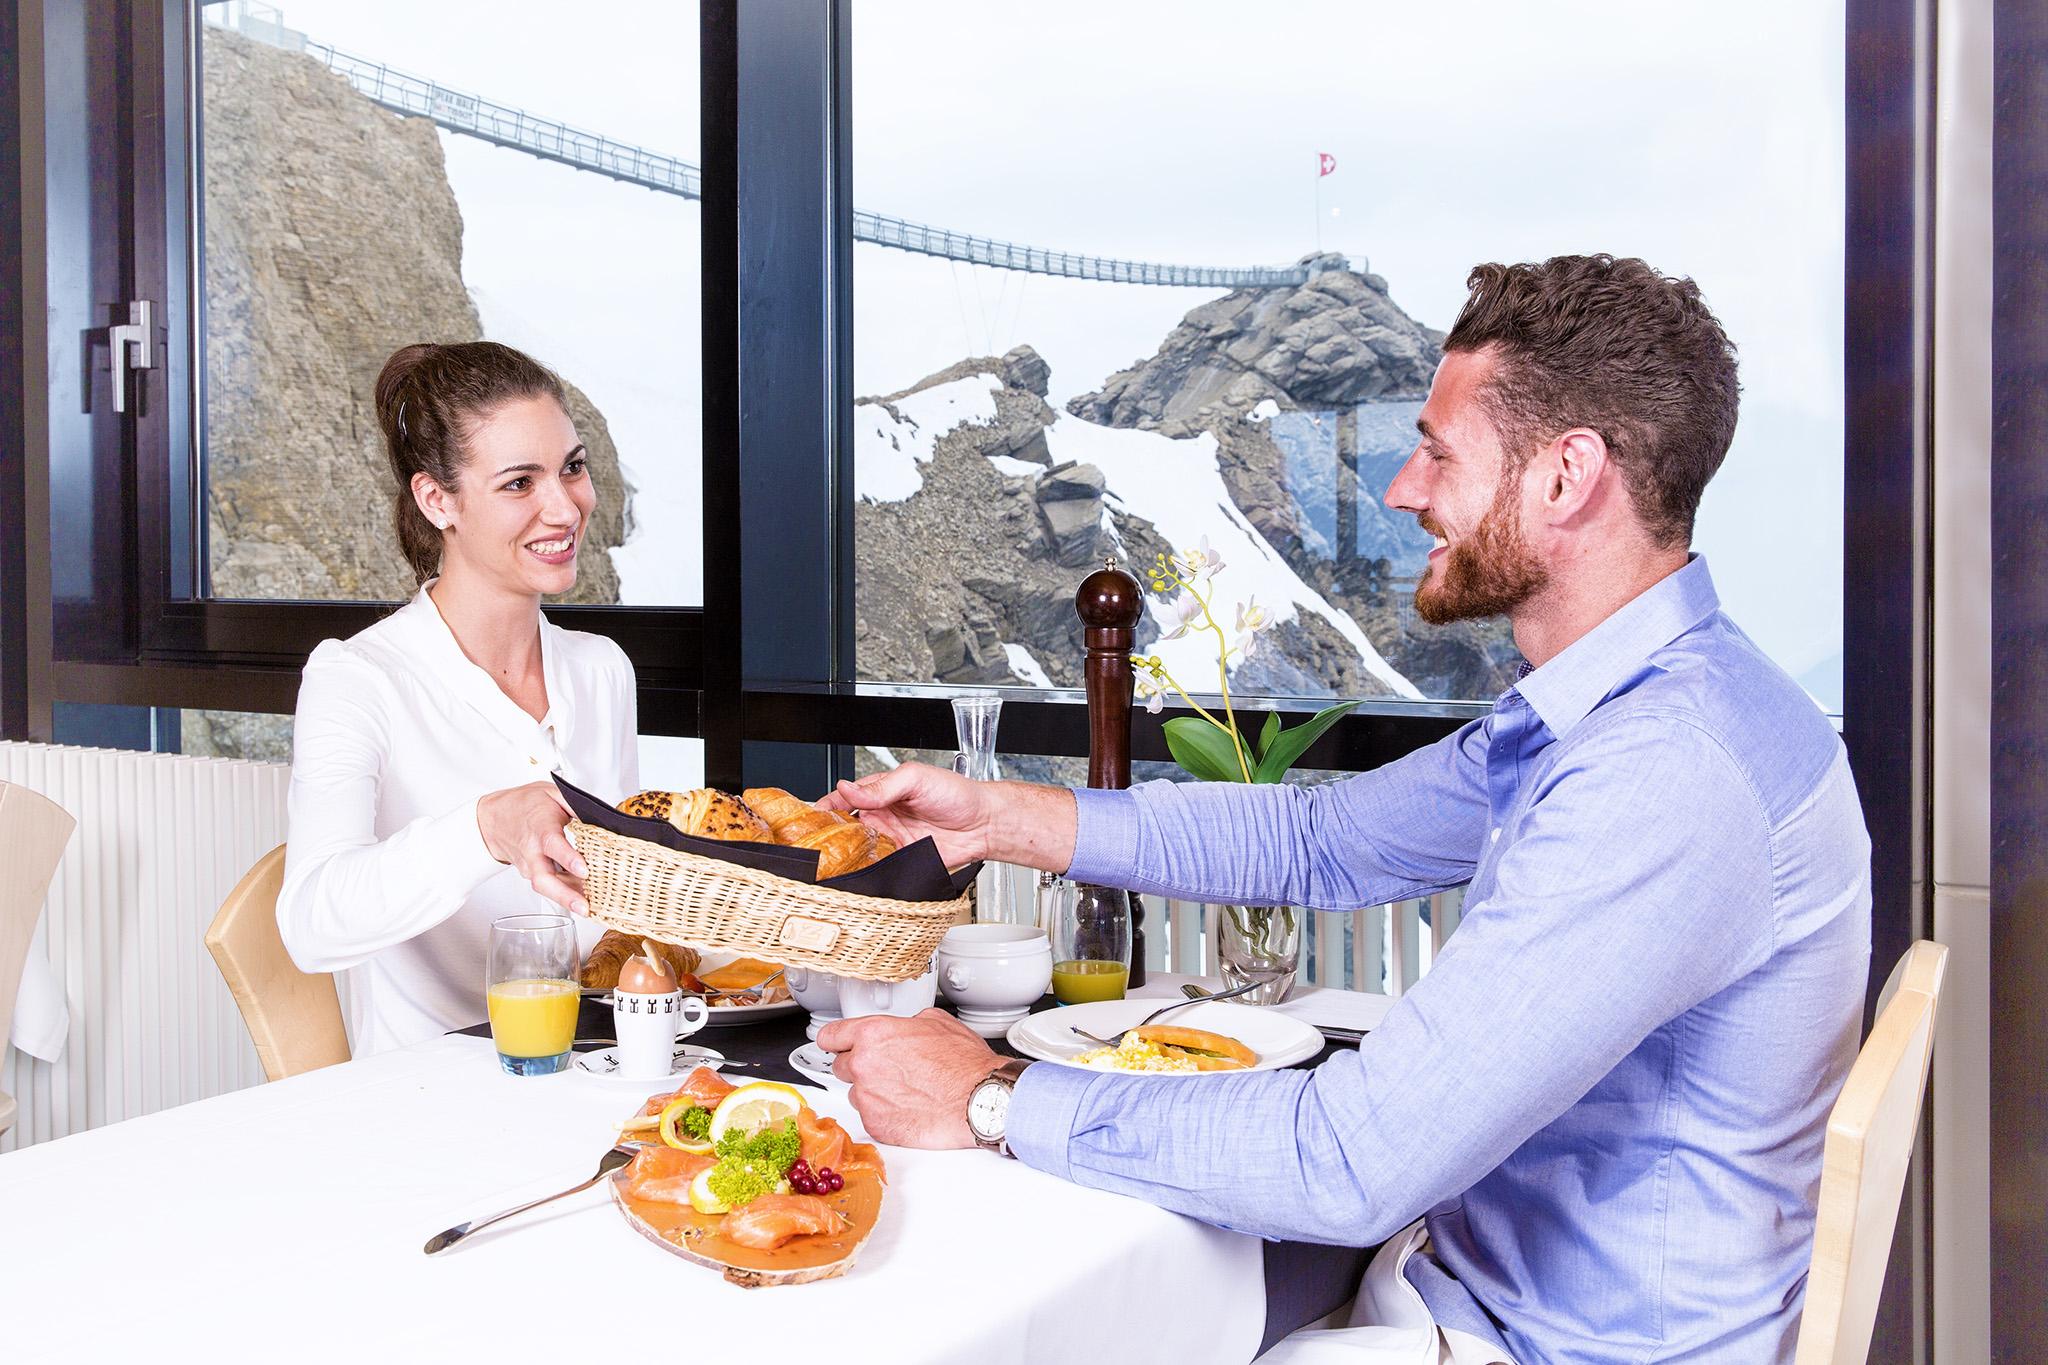 kt_2020_320_Keytours_excursions_Swisstours_glacier3000_restaurant4_2048_10